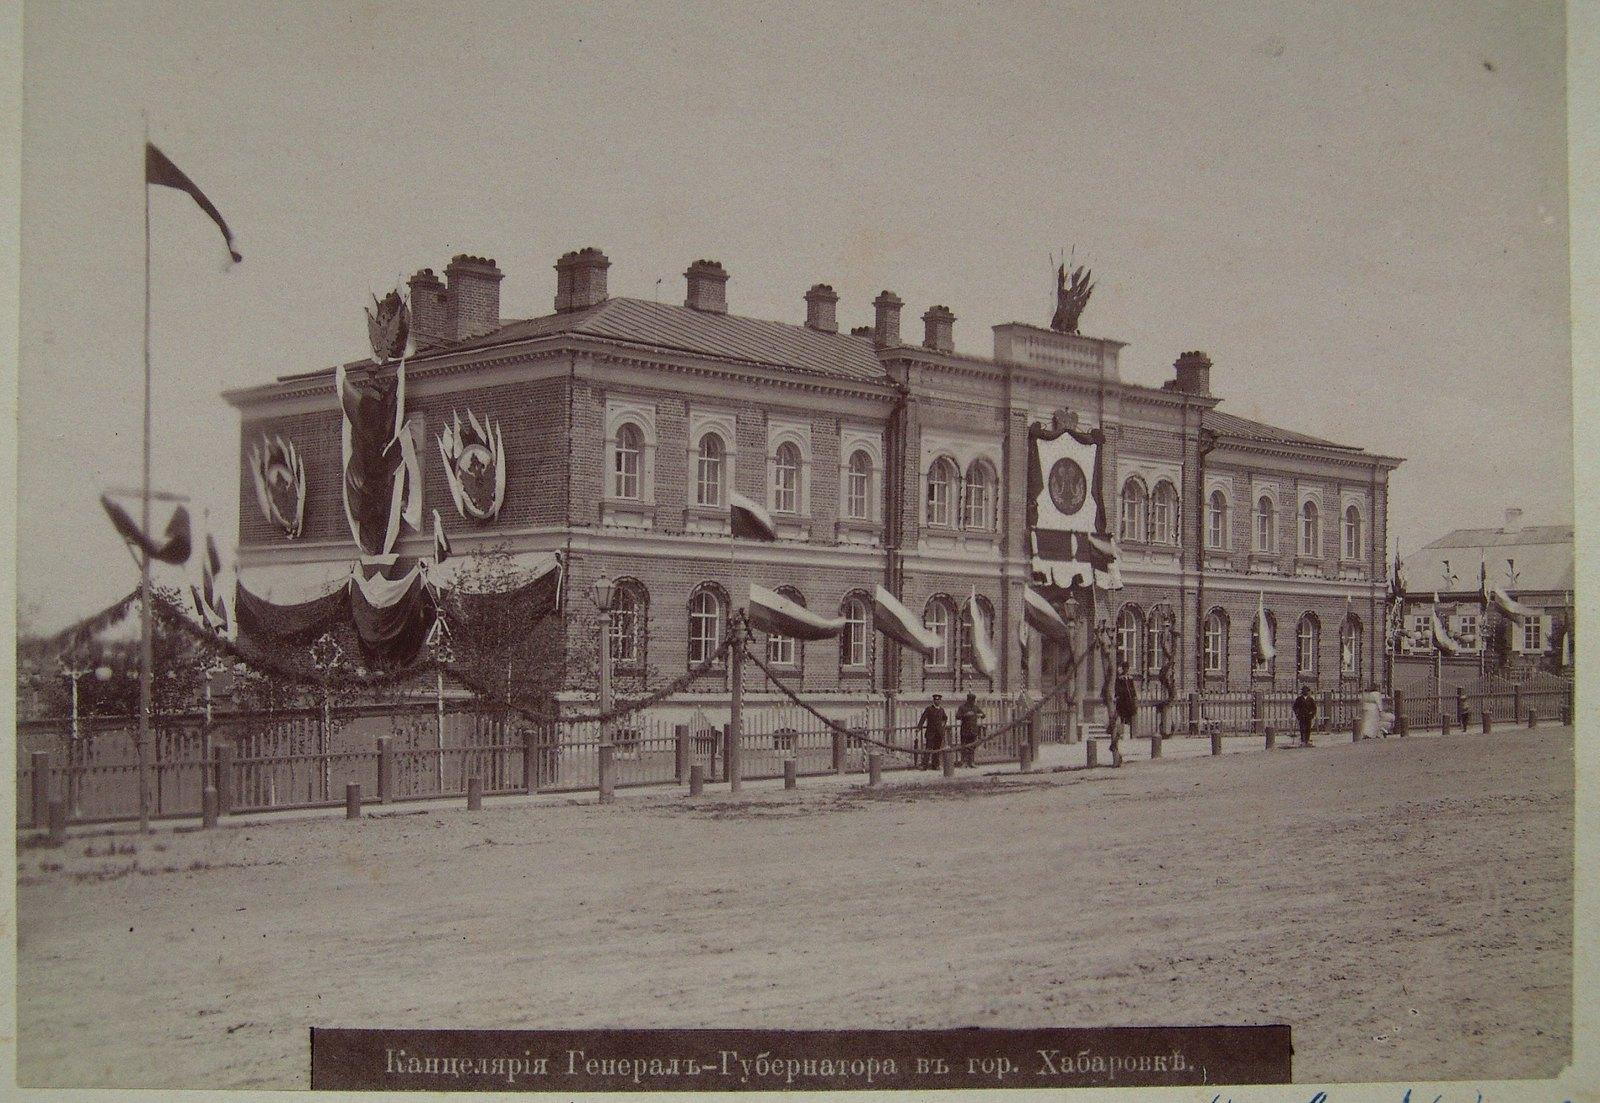 06. 1891. Хабаровка. Канцелярия генерал-губернатора